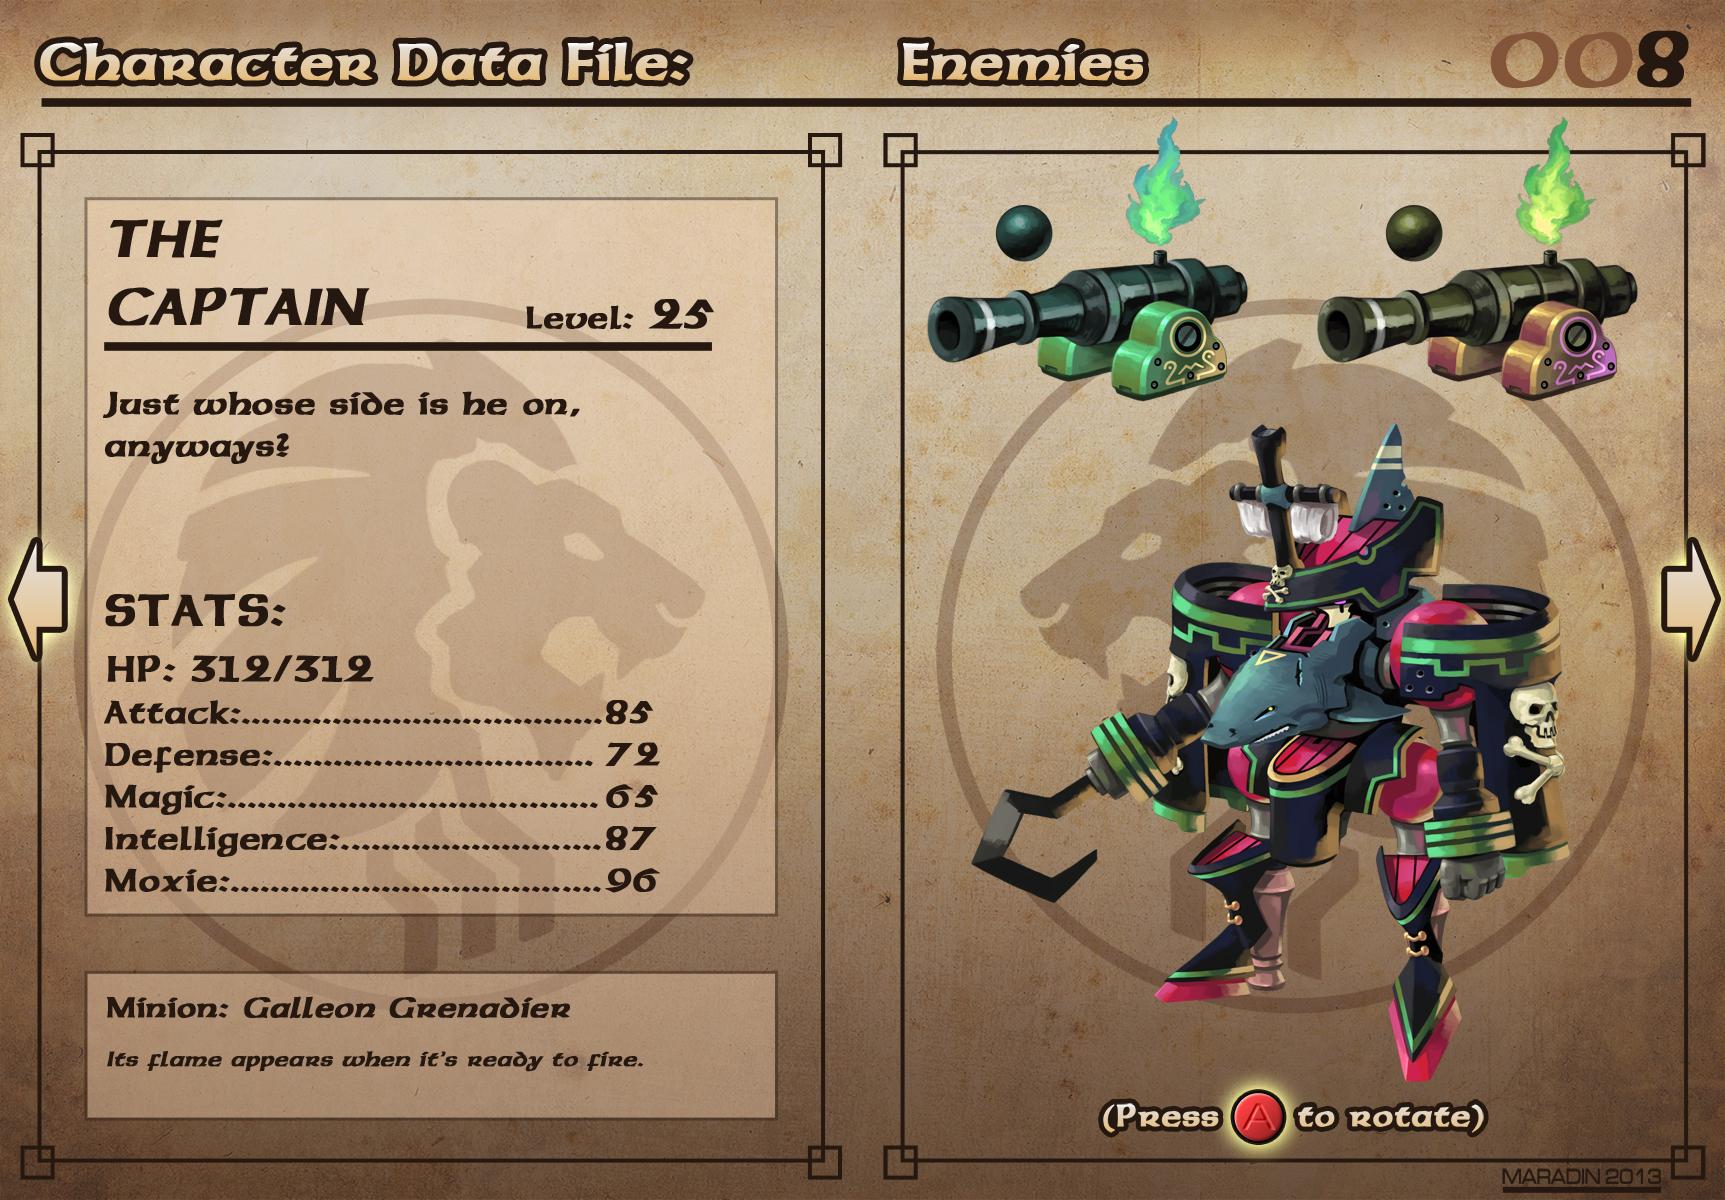 Castelaria Data File 08: The Captain by Nidaram